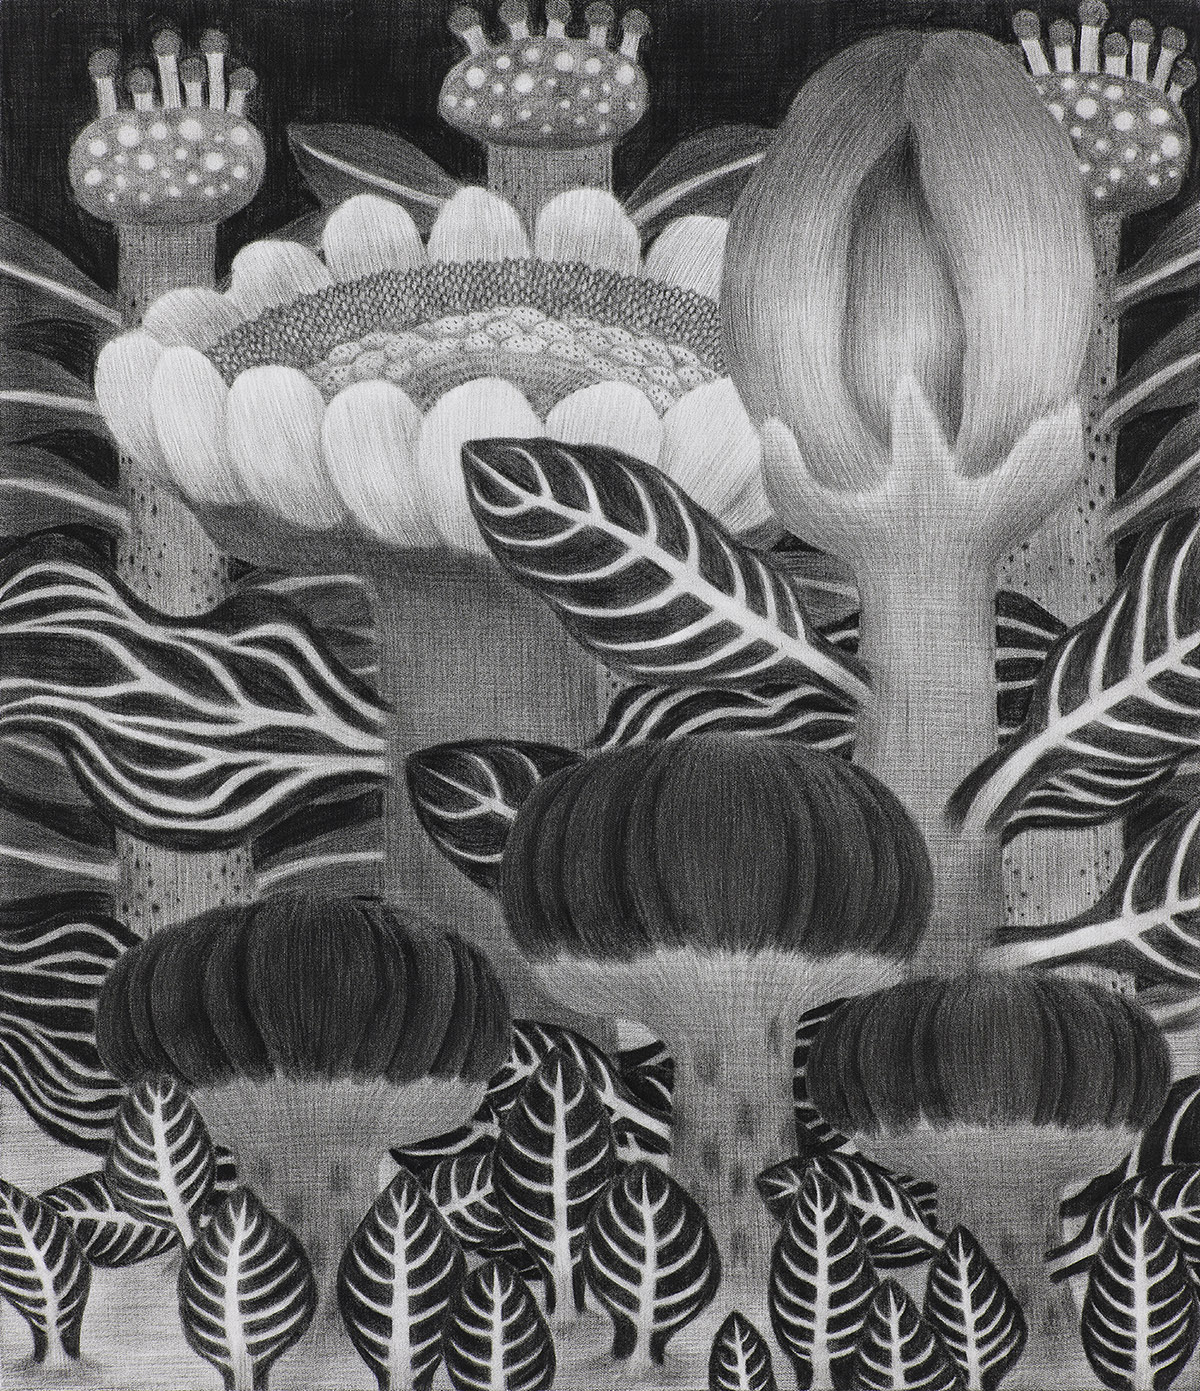 [20p2609] 2020_식물숲 #1_conte on daimaru_53.0×45.5.jpg